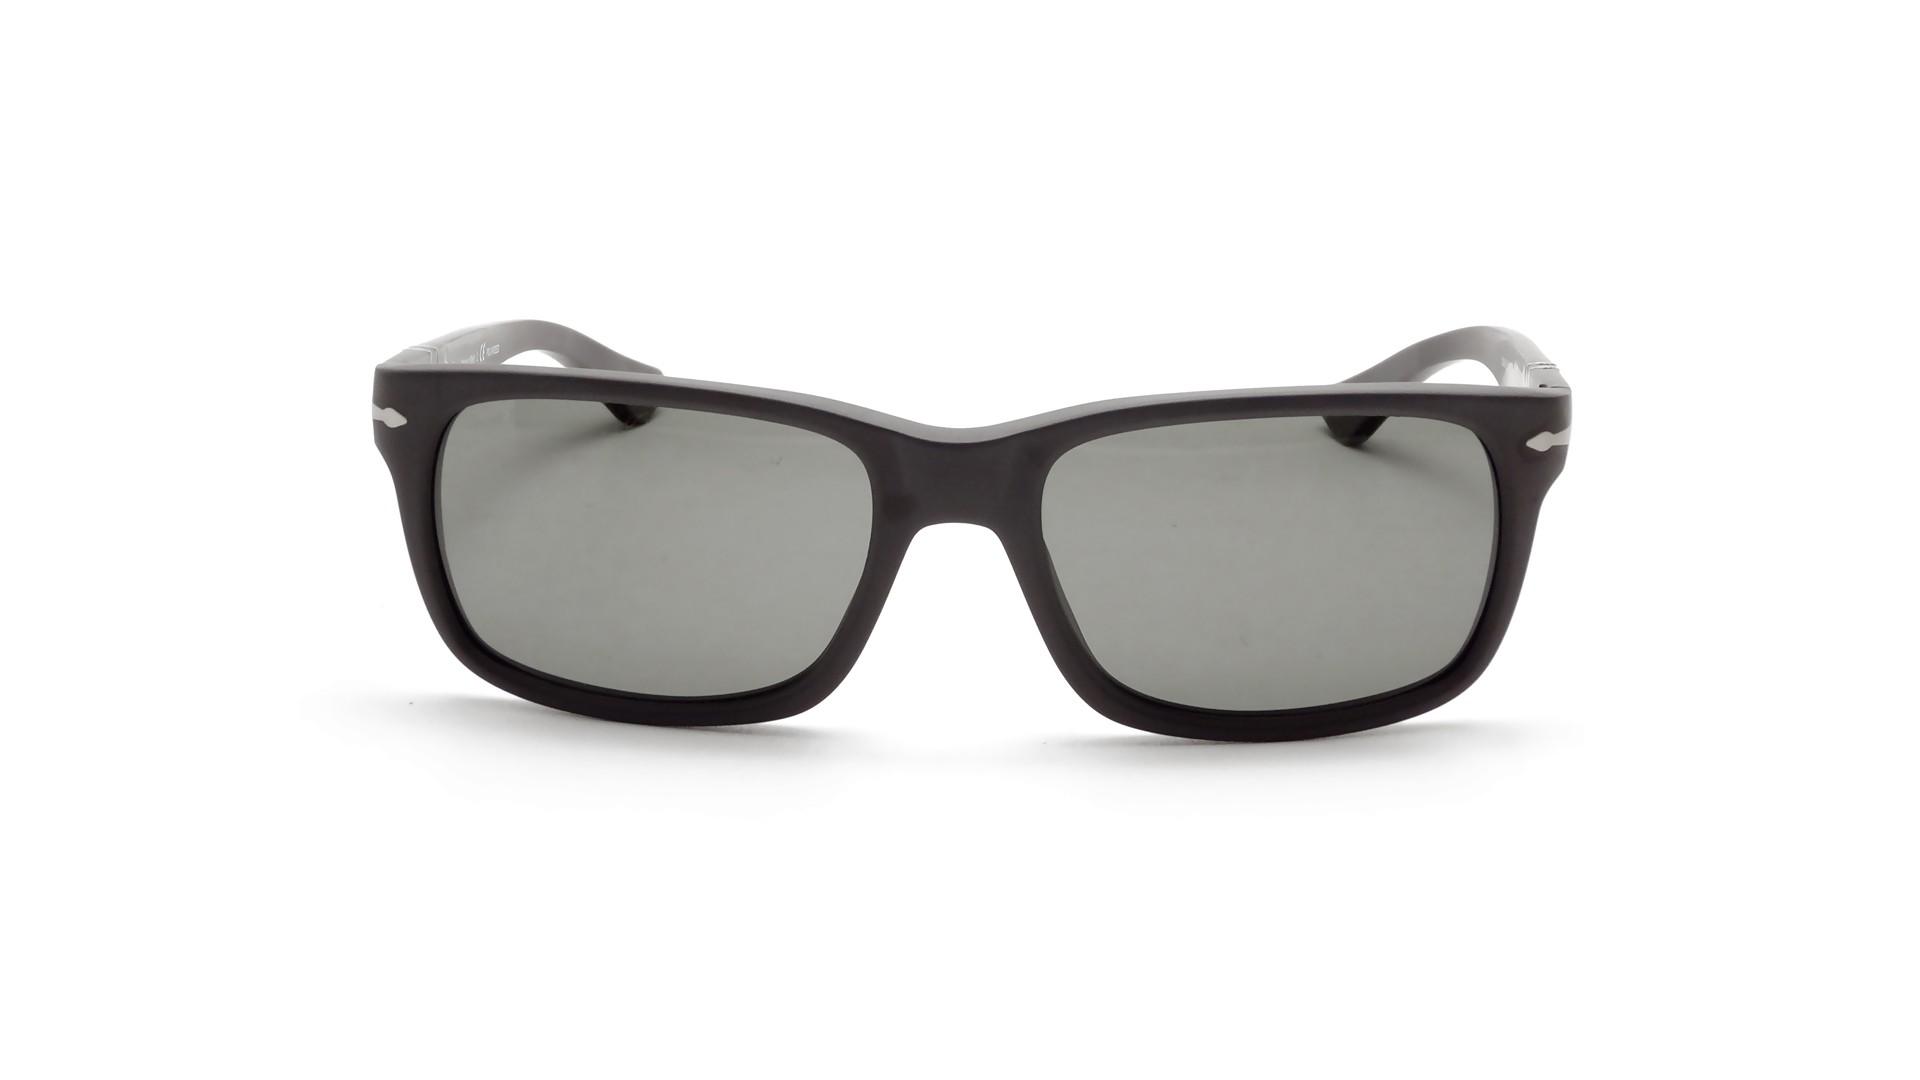 Persol Polarized Sunglasses Sizing   Louisiana Bucket Brigade 215ad1d094